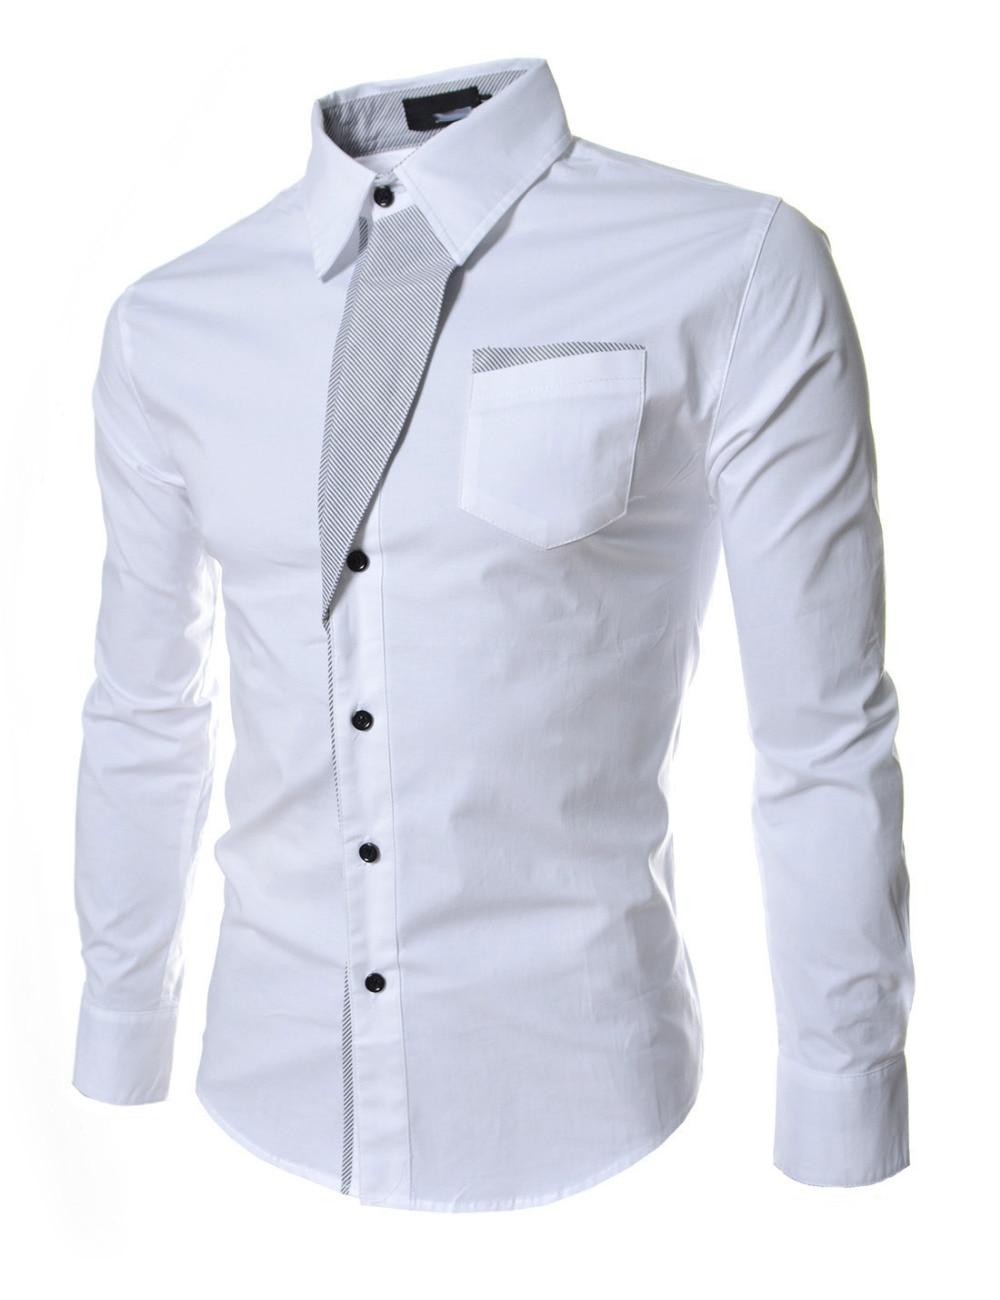 Shirt design gents - Top Sale Mens Stylish Casual Shirt Spring Men Long Sleeve Slim Fit Shirt 2016 Male Wedding